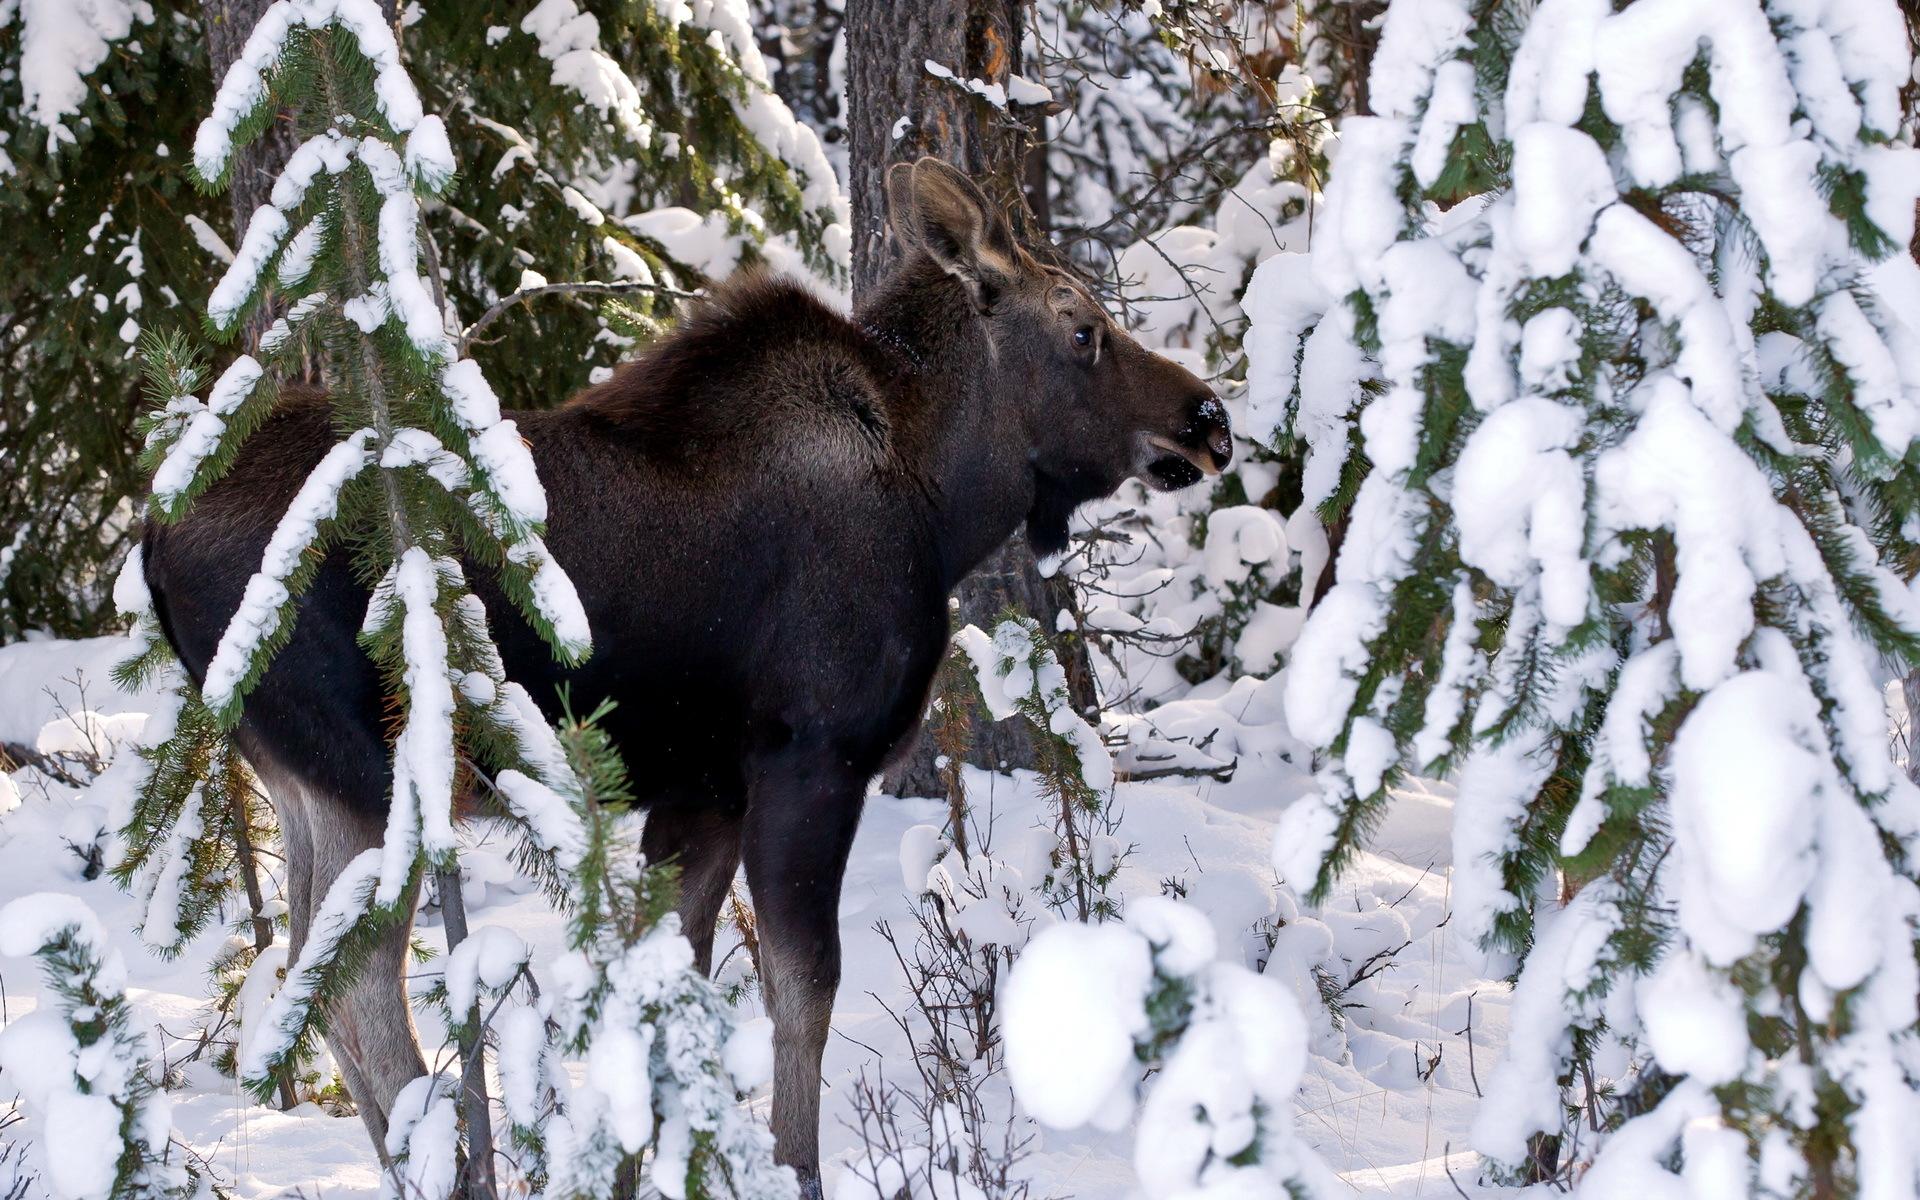 Moose deer winter snow wallpaper 1920x1200 31100 WallpaperUP 1920x1200